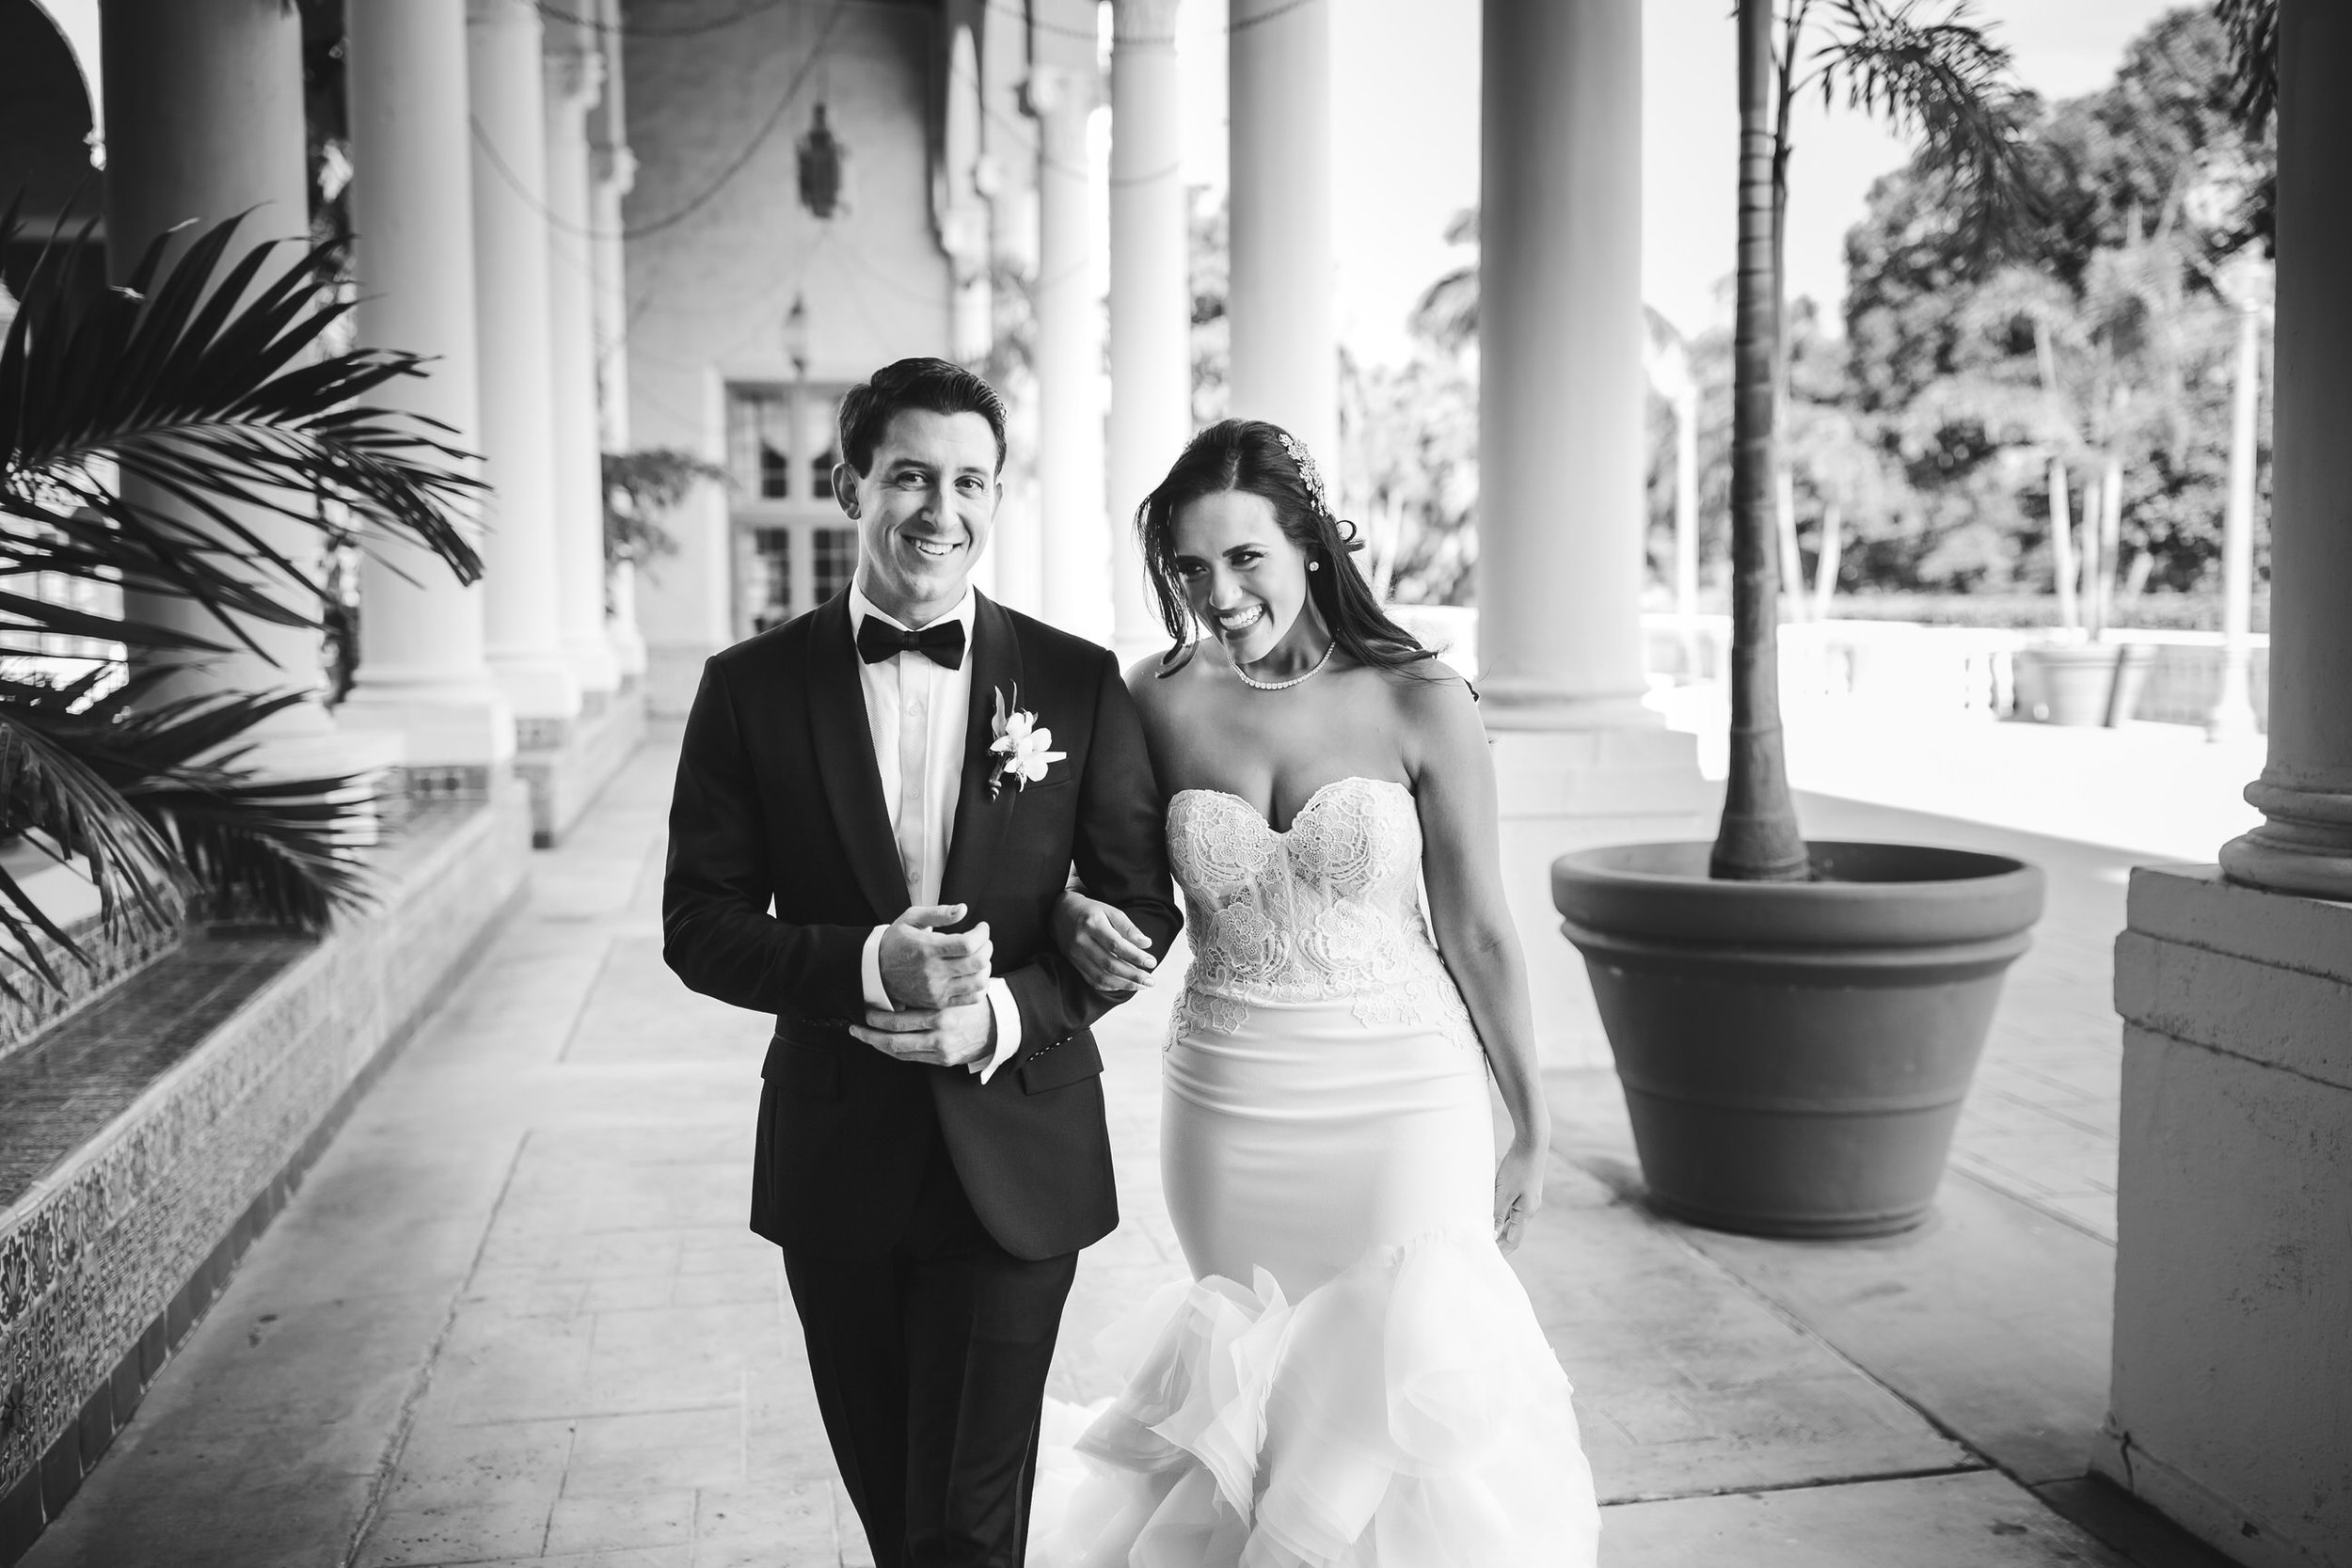 biltmore-wedding-steph-lynn-photo-photographer-bride-and-groom-16.jpg